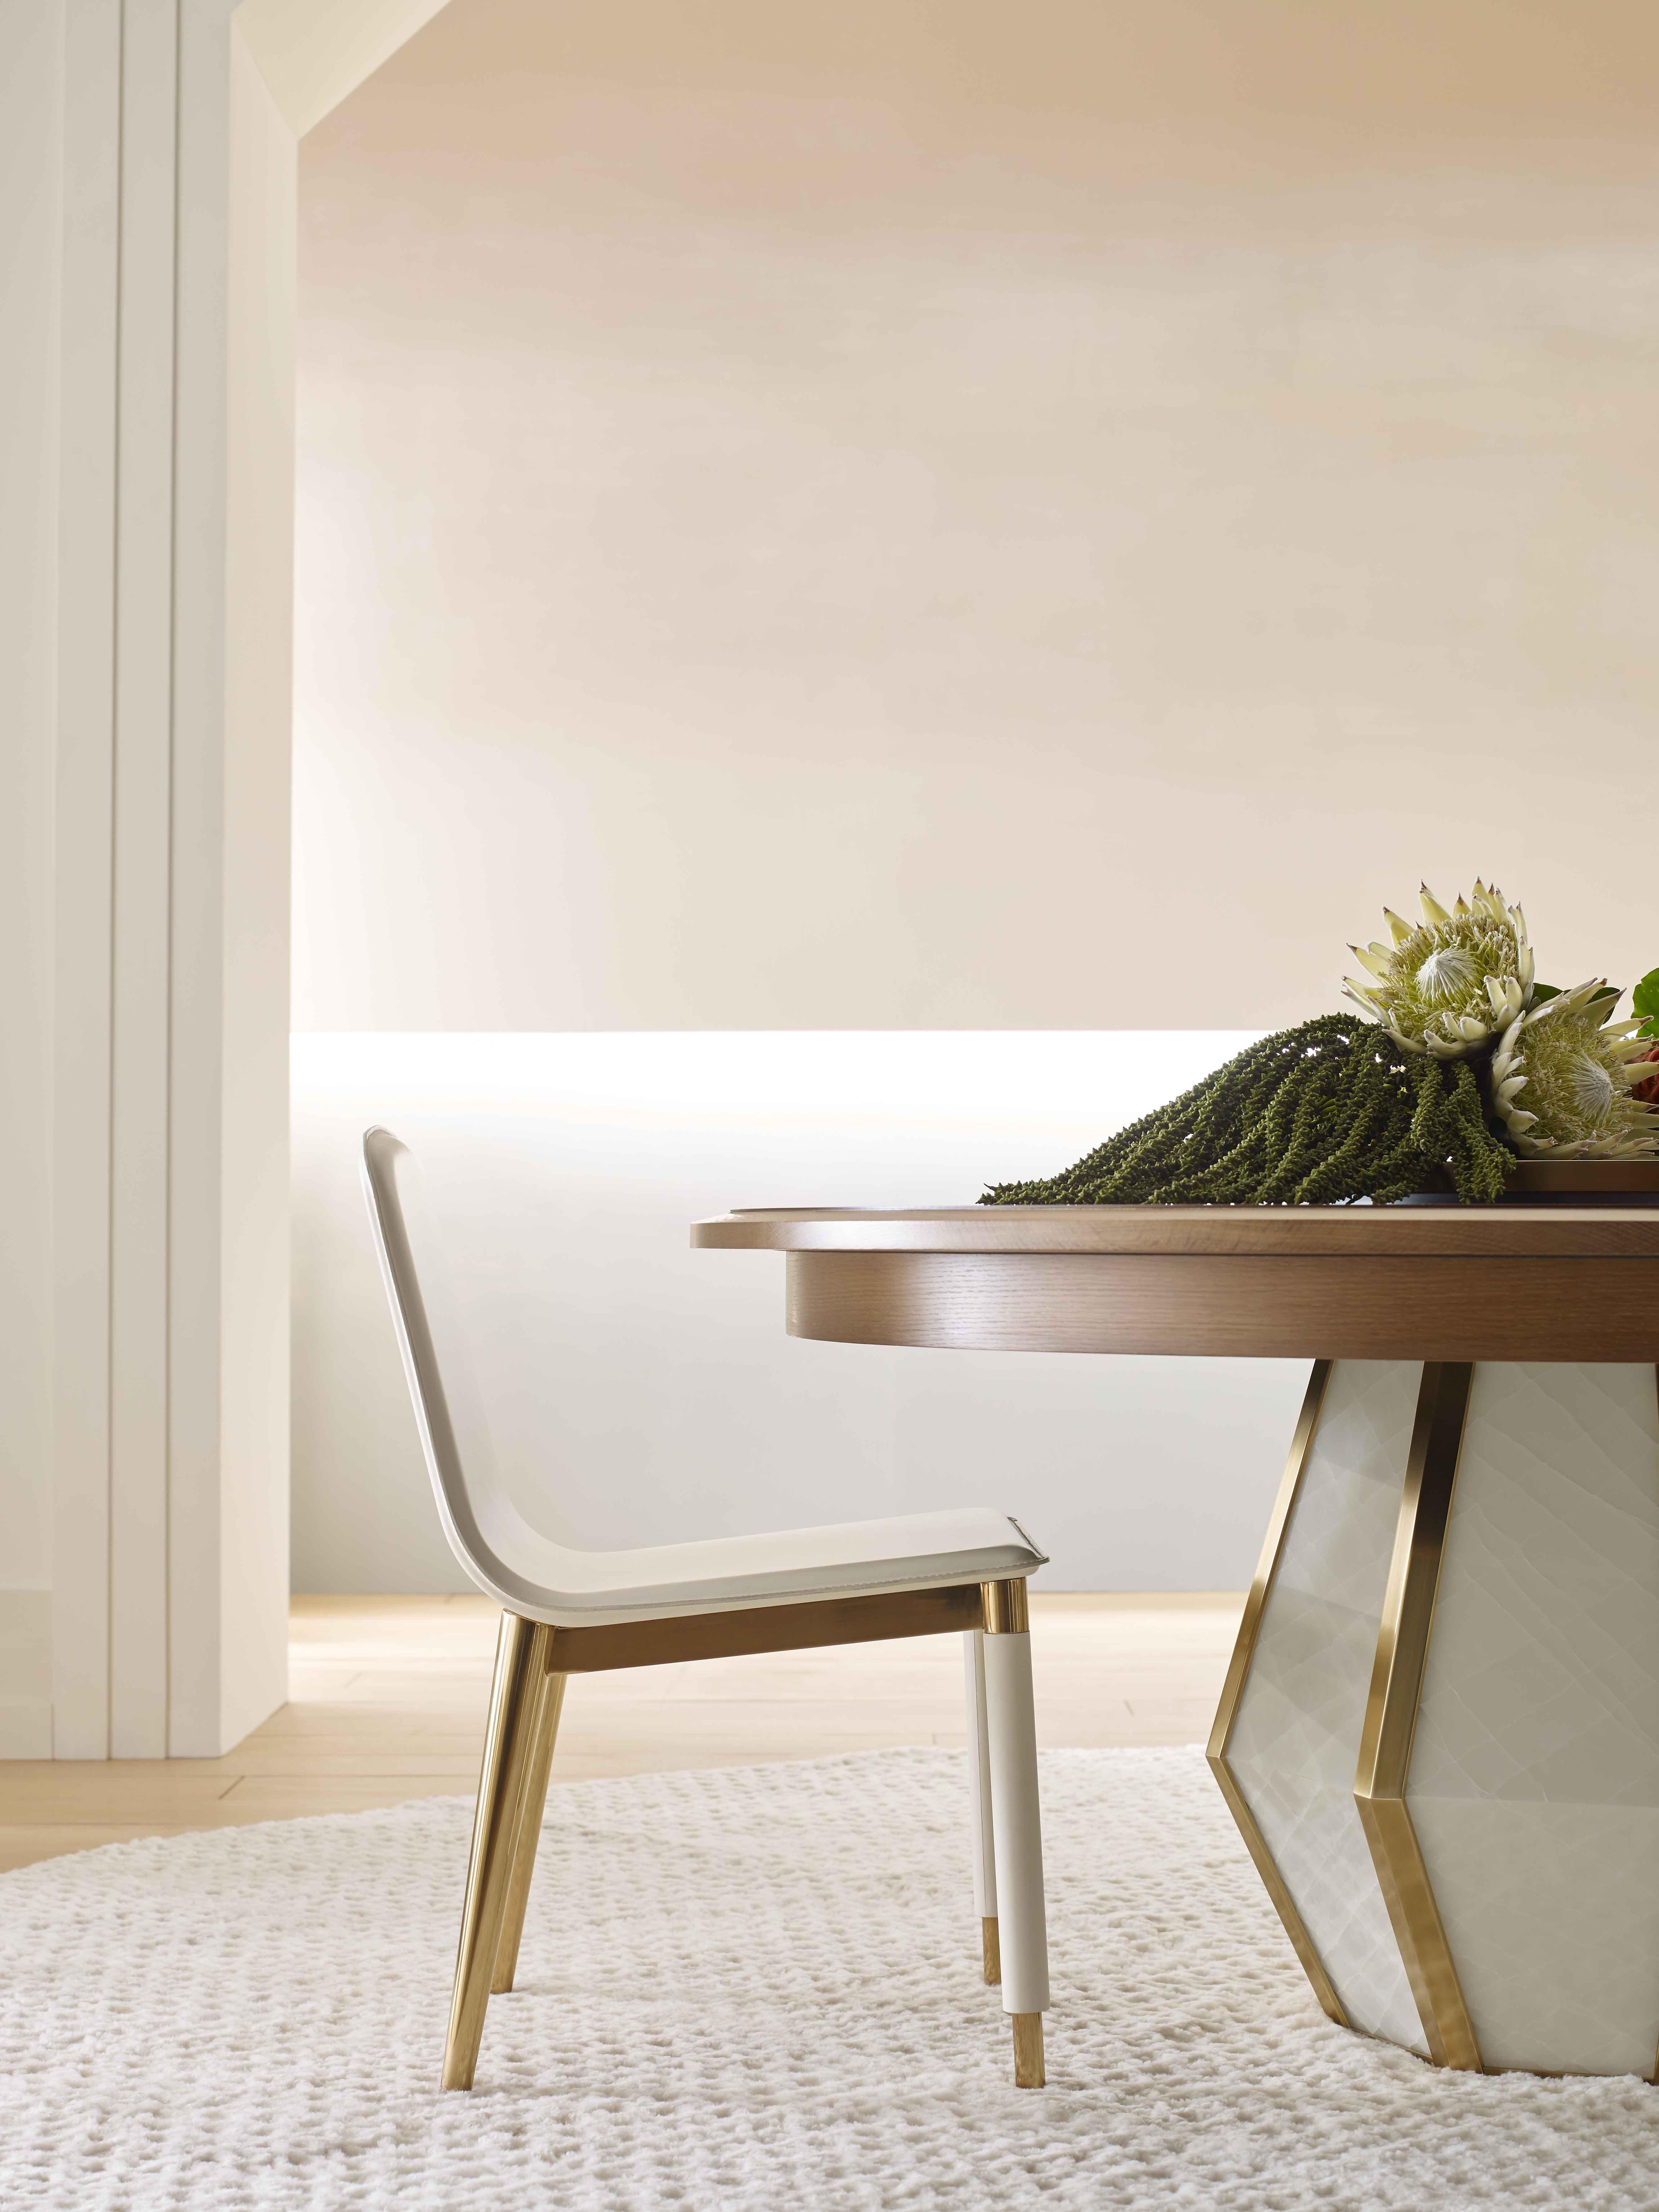 The Laura Kirar Collection For Baker Furniture Baker Furniture